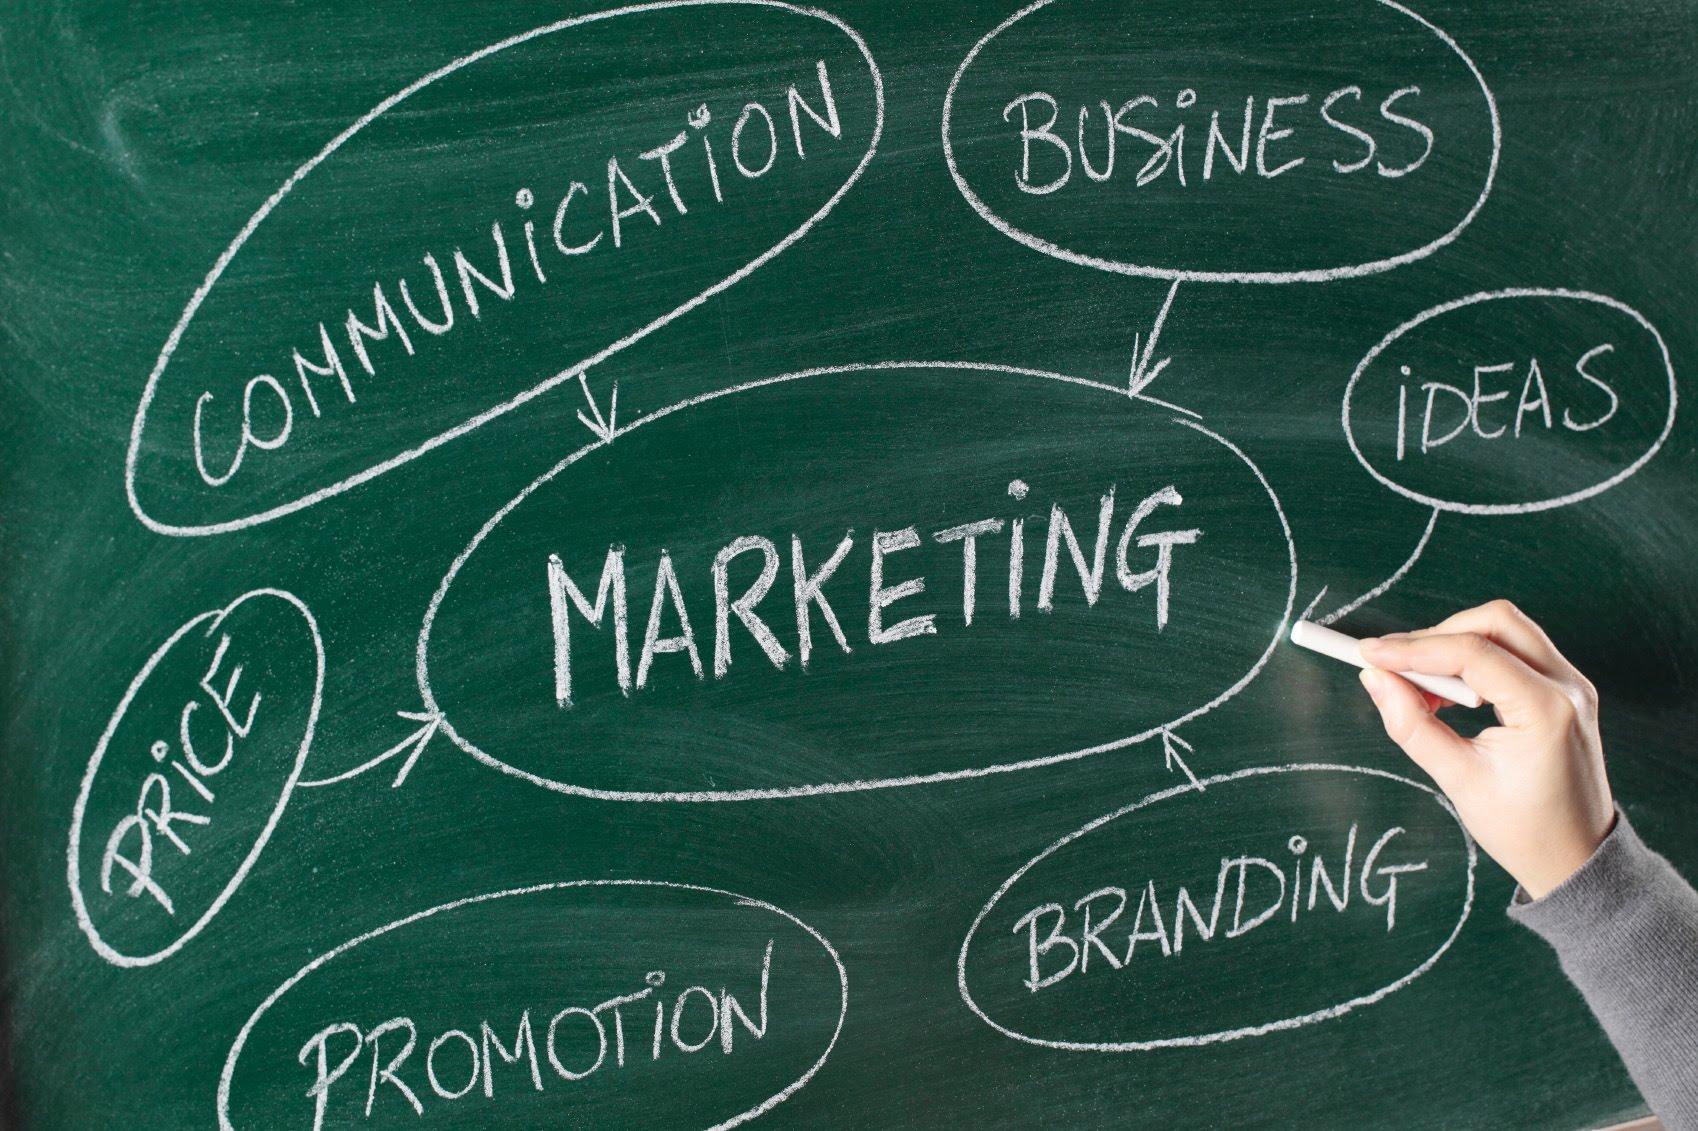 50 Citazioni E Frasi Celebri Dei Guru Del Marketing